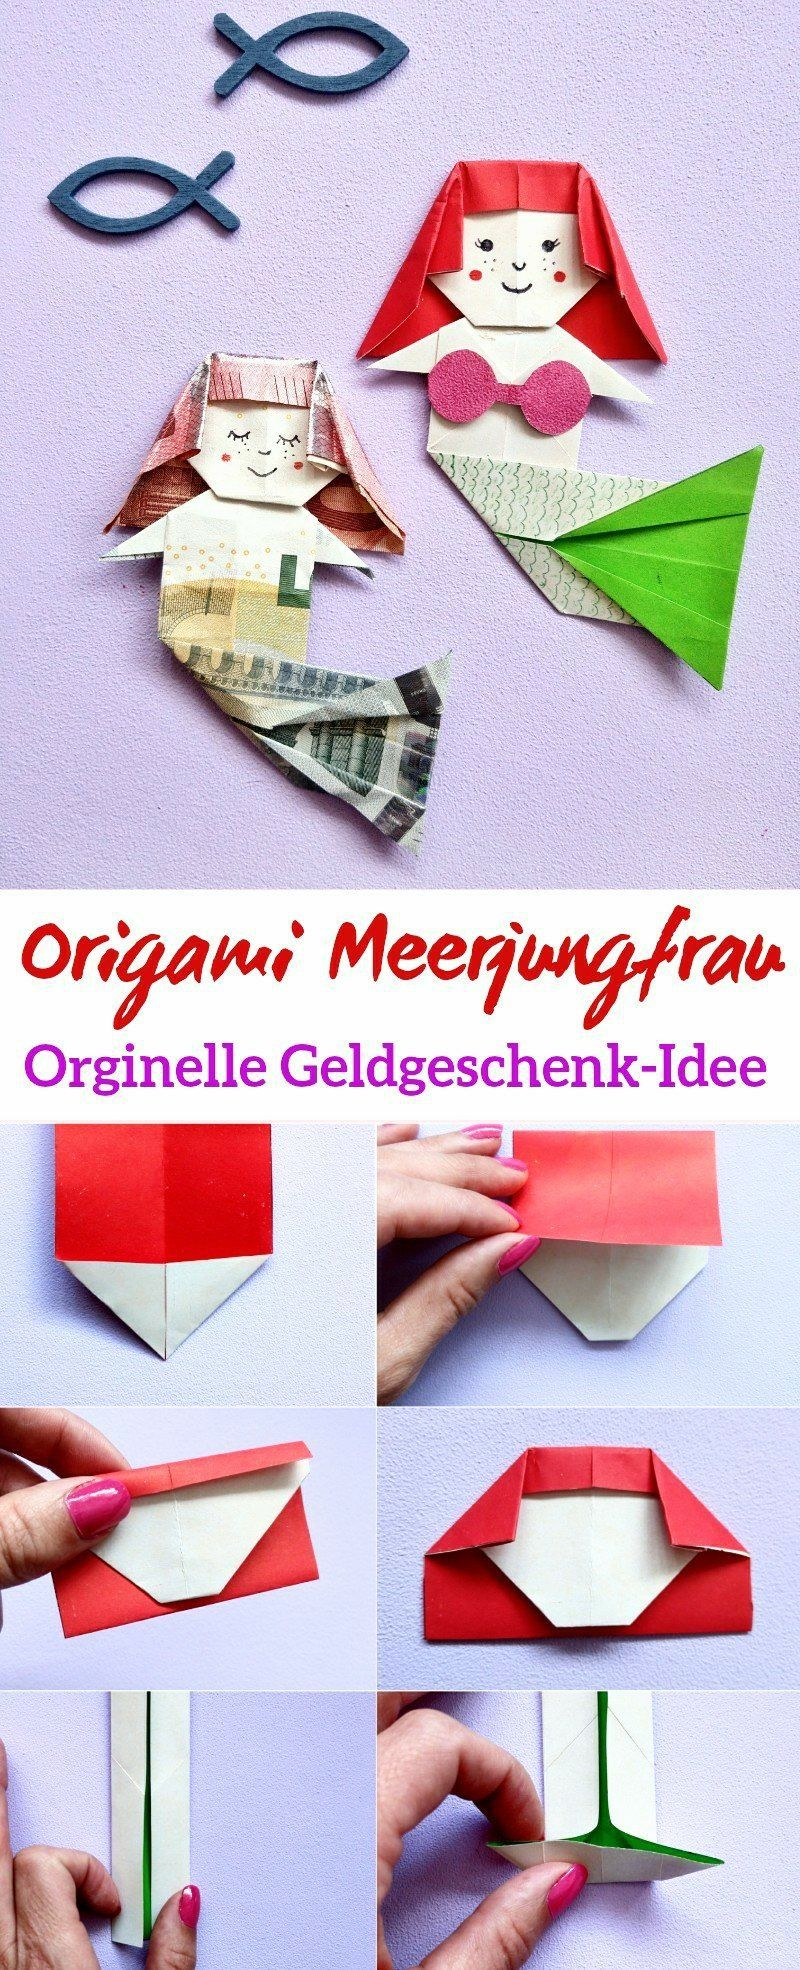 Origami Meerjungfrau Falten Originelles Geldgeschenk Zum Falten